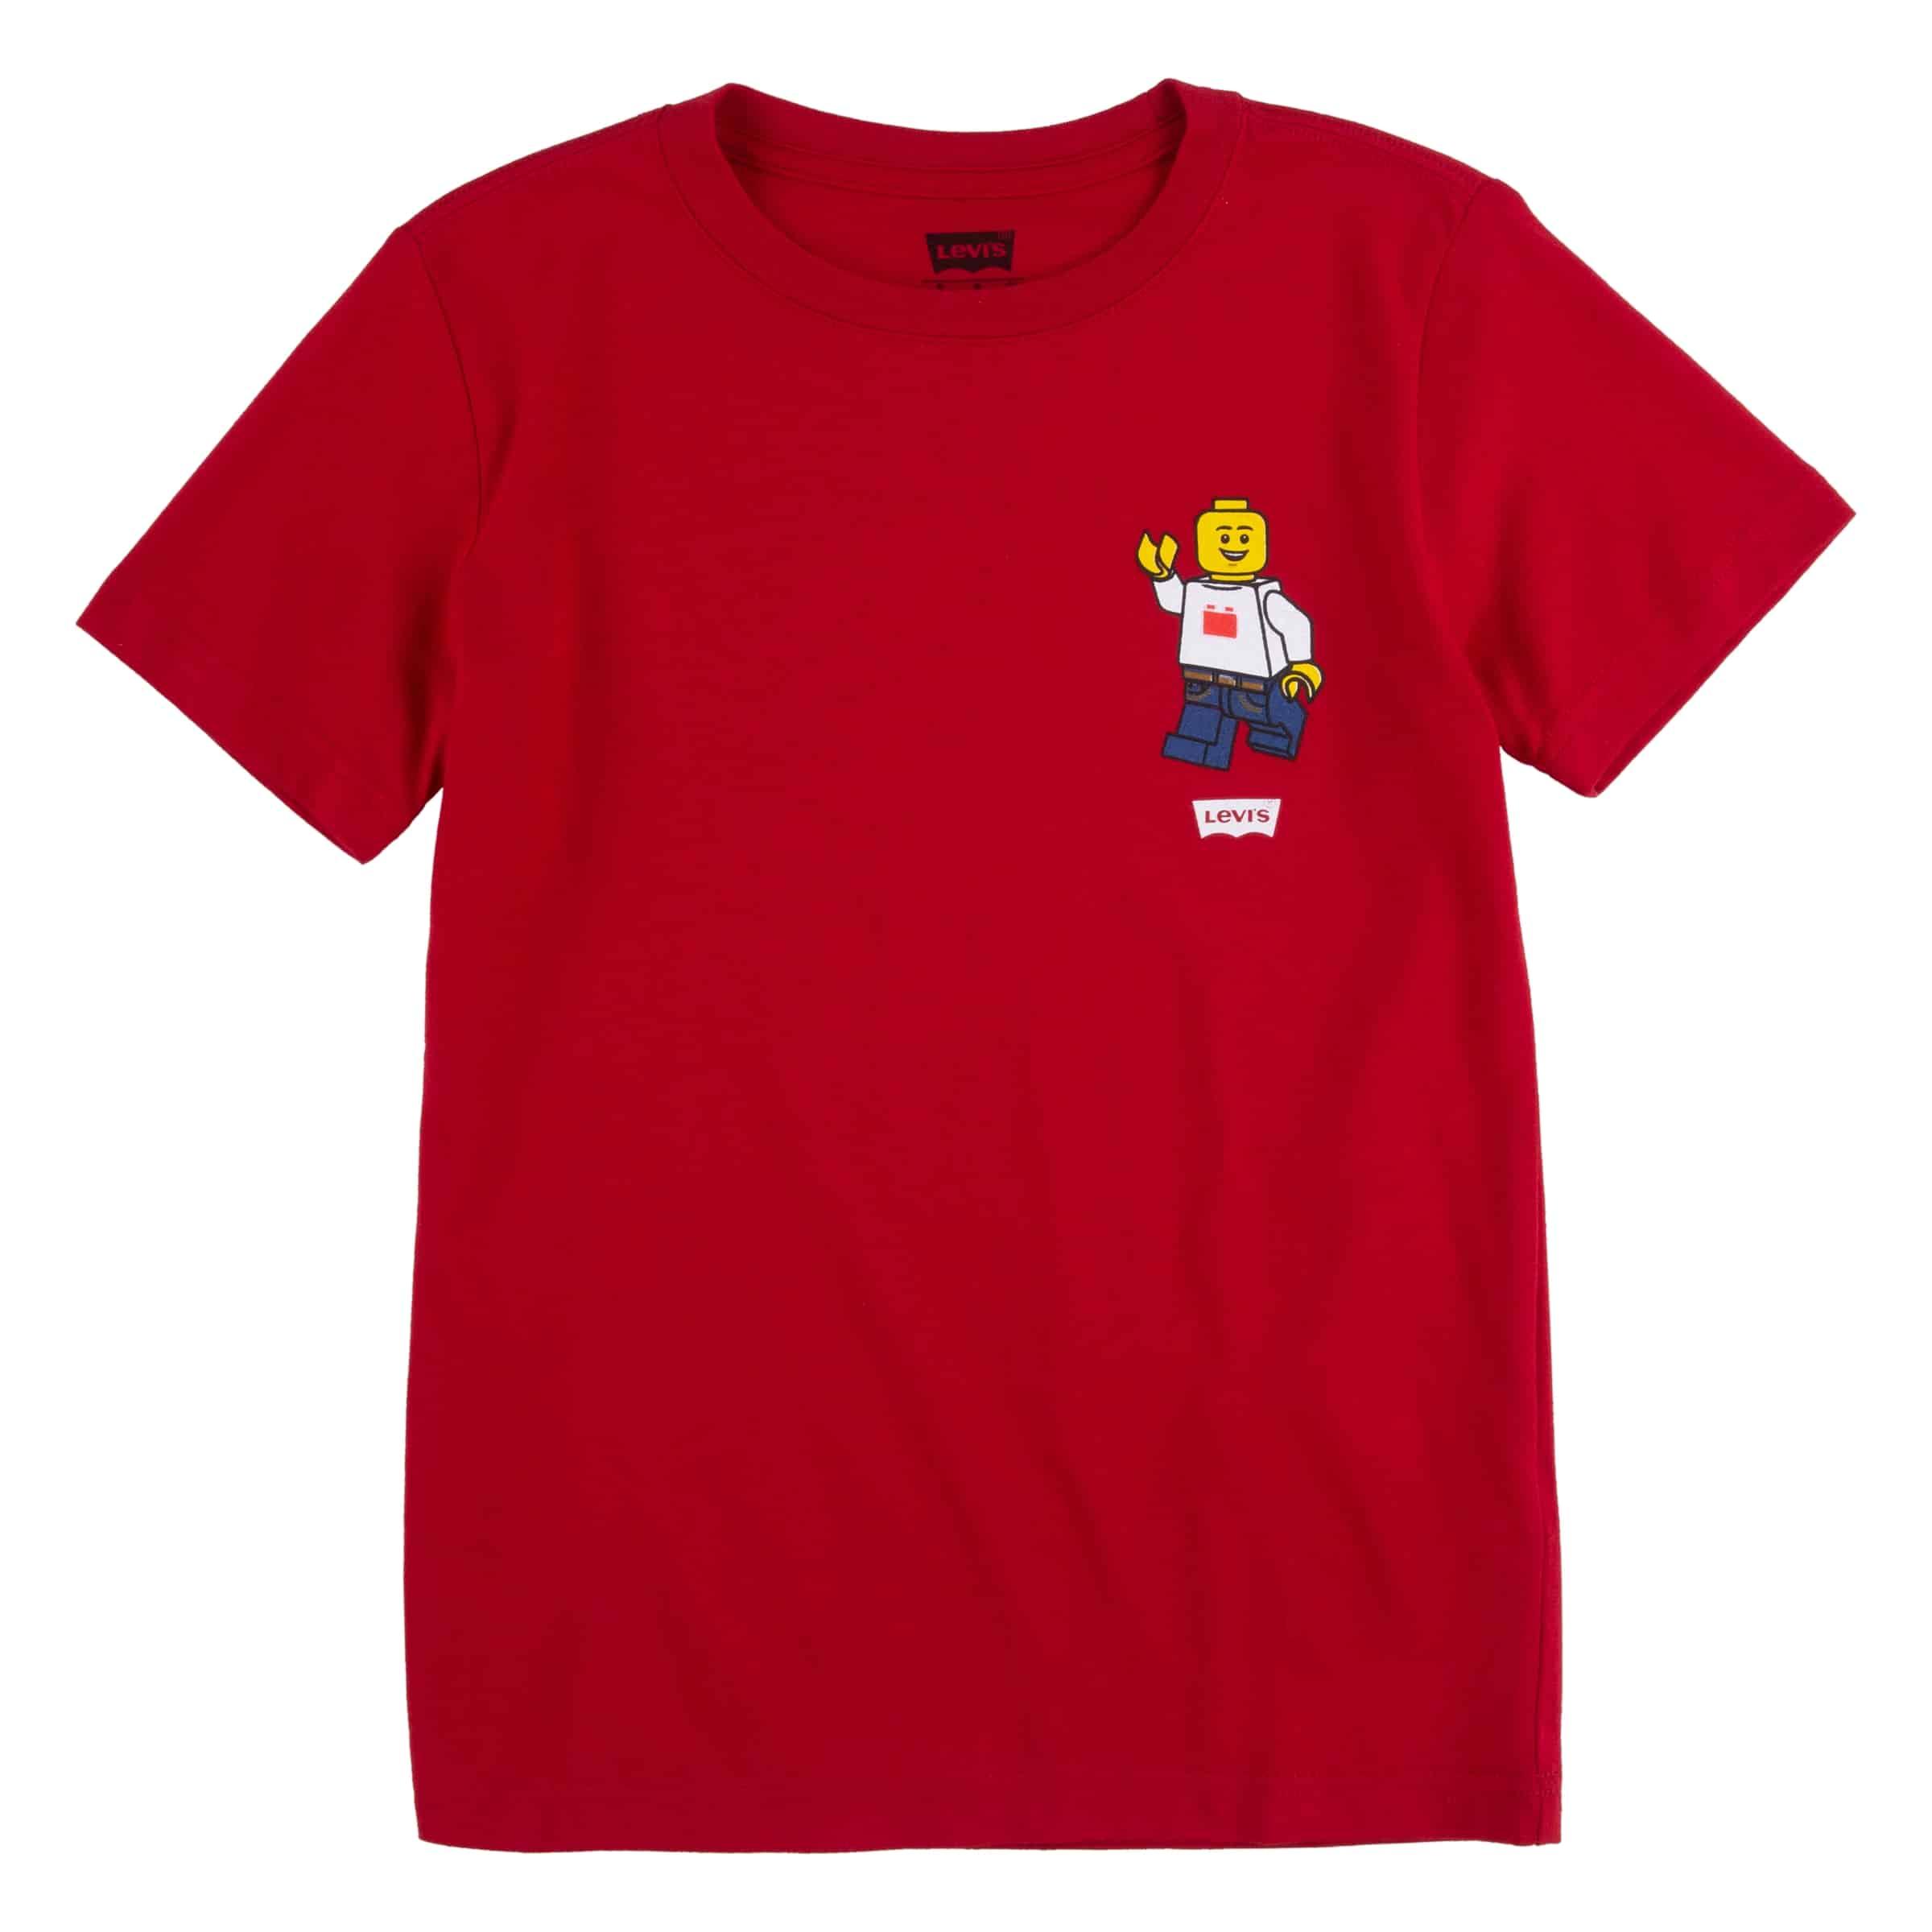 levis x lego 5006405 logo t shirt 2 4